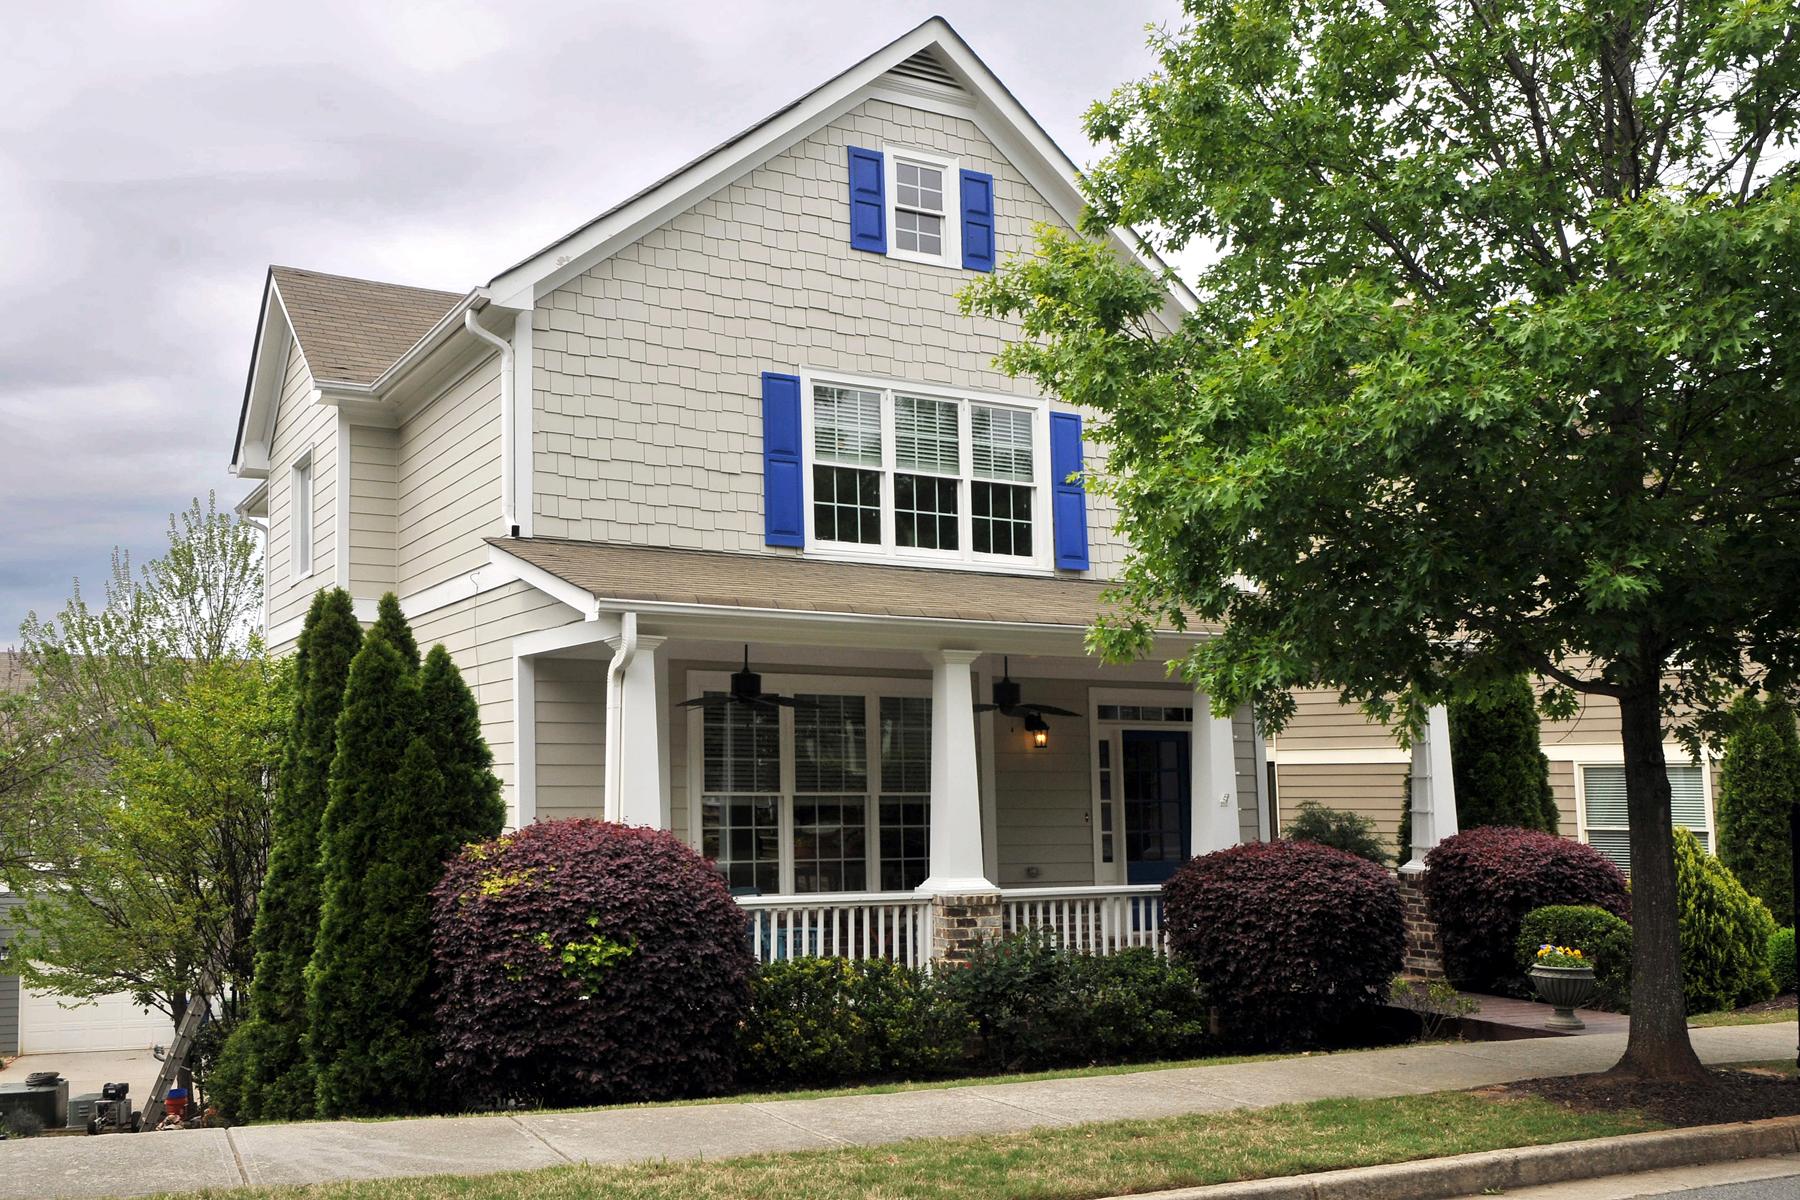 独户住宅 为 销售 在 Charming Traditional Cottage-style Home 1572 Gilstrap Lane NW 亚特兰大, 乔治亚州, 30318 美国